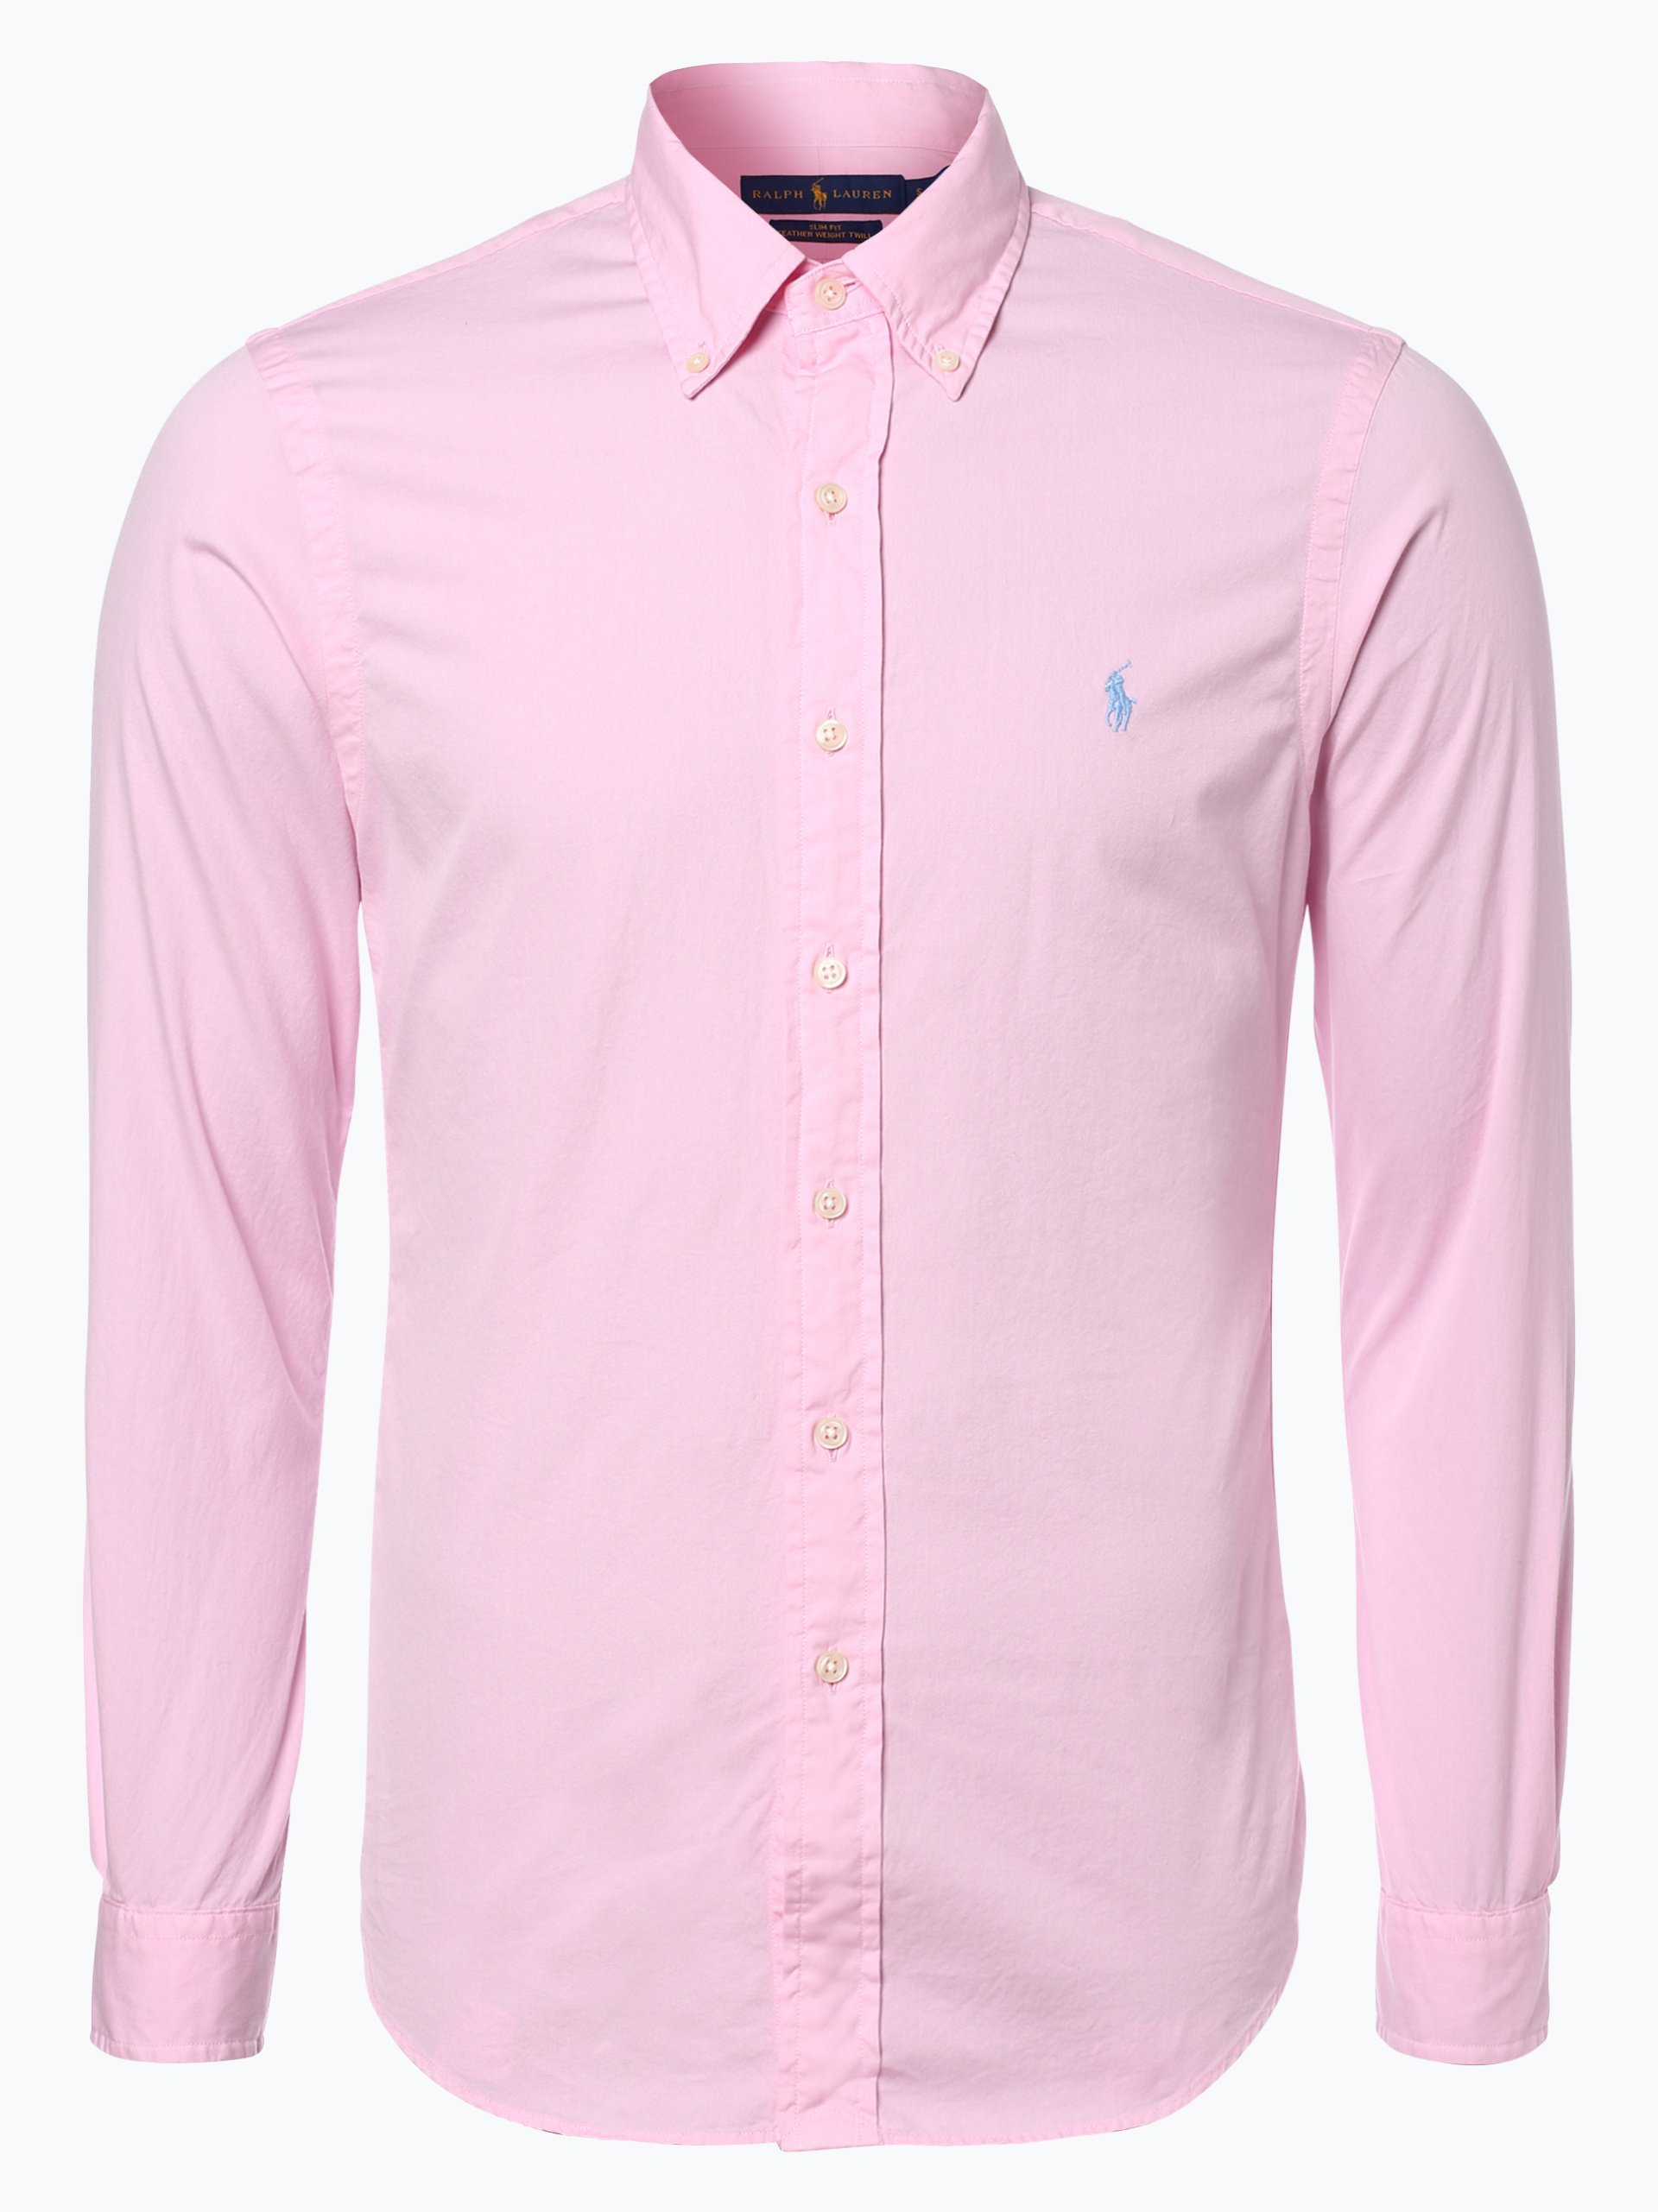 polo ralph lauren herren hemd slim fit pink uni online. Black Bedroom Furniture Sets. Home Design Ideas